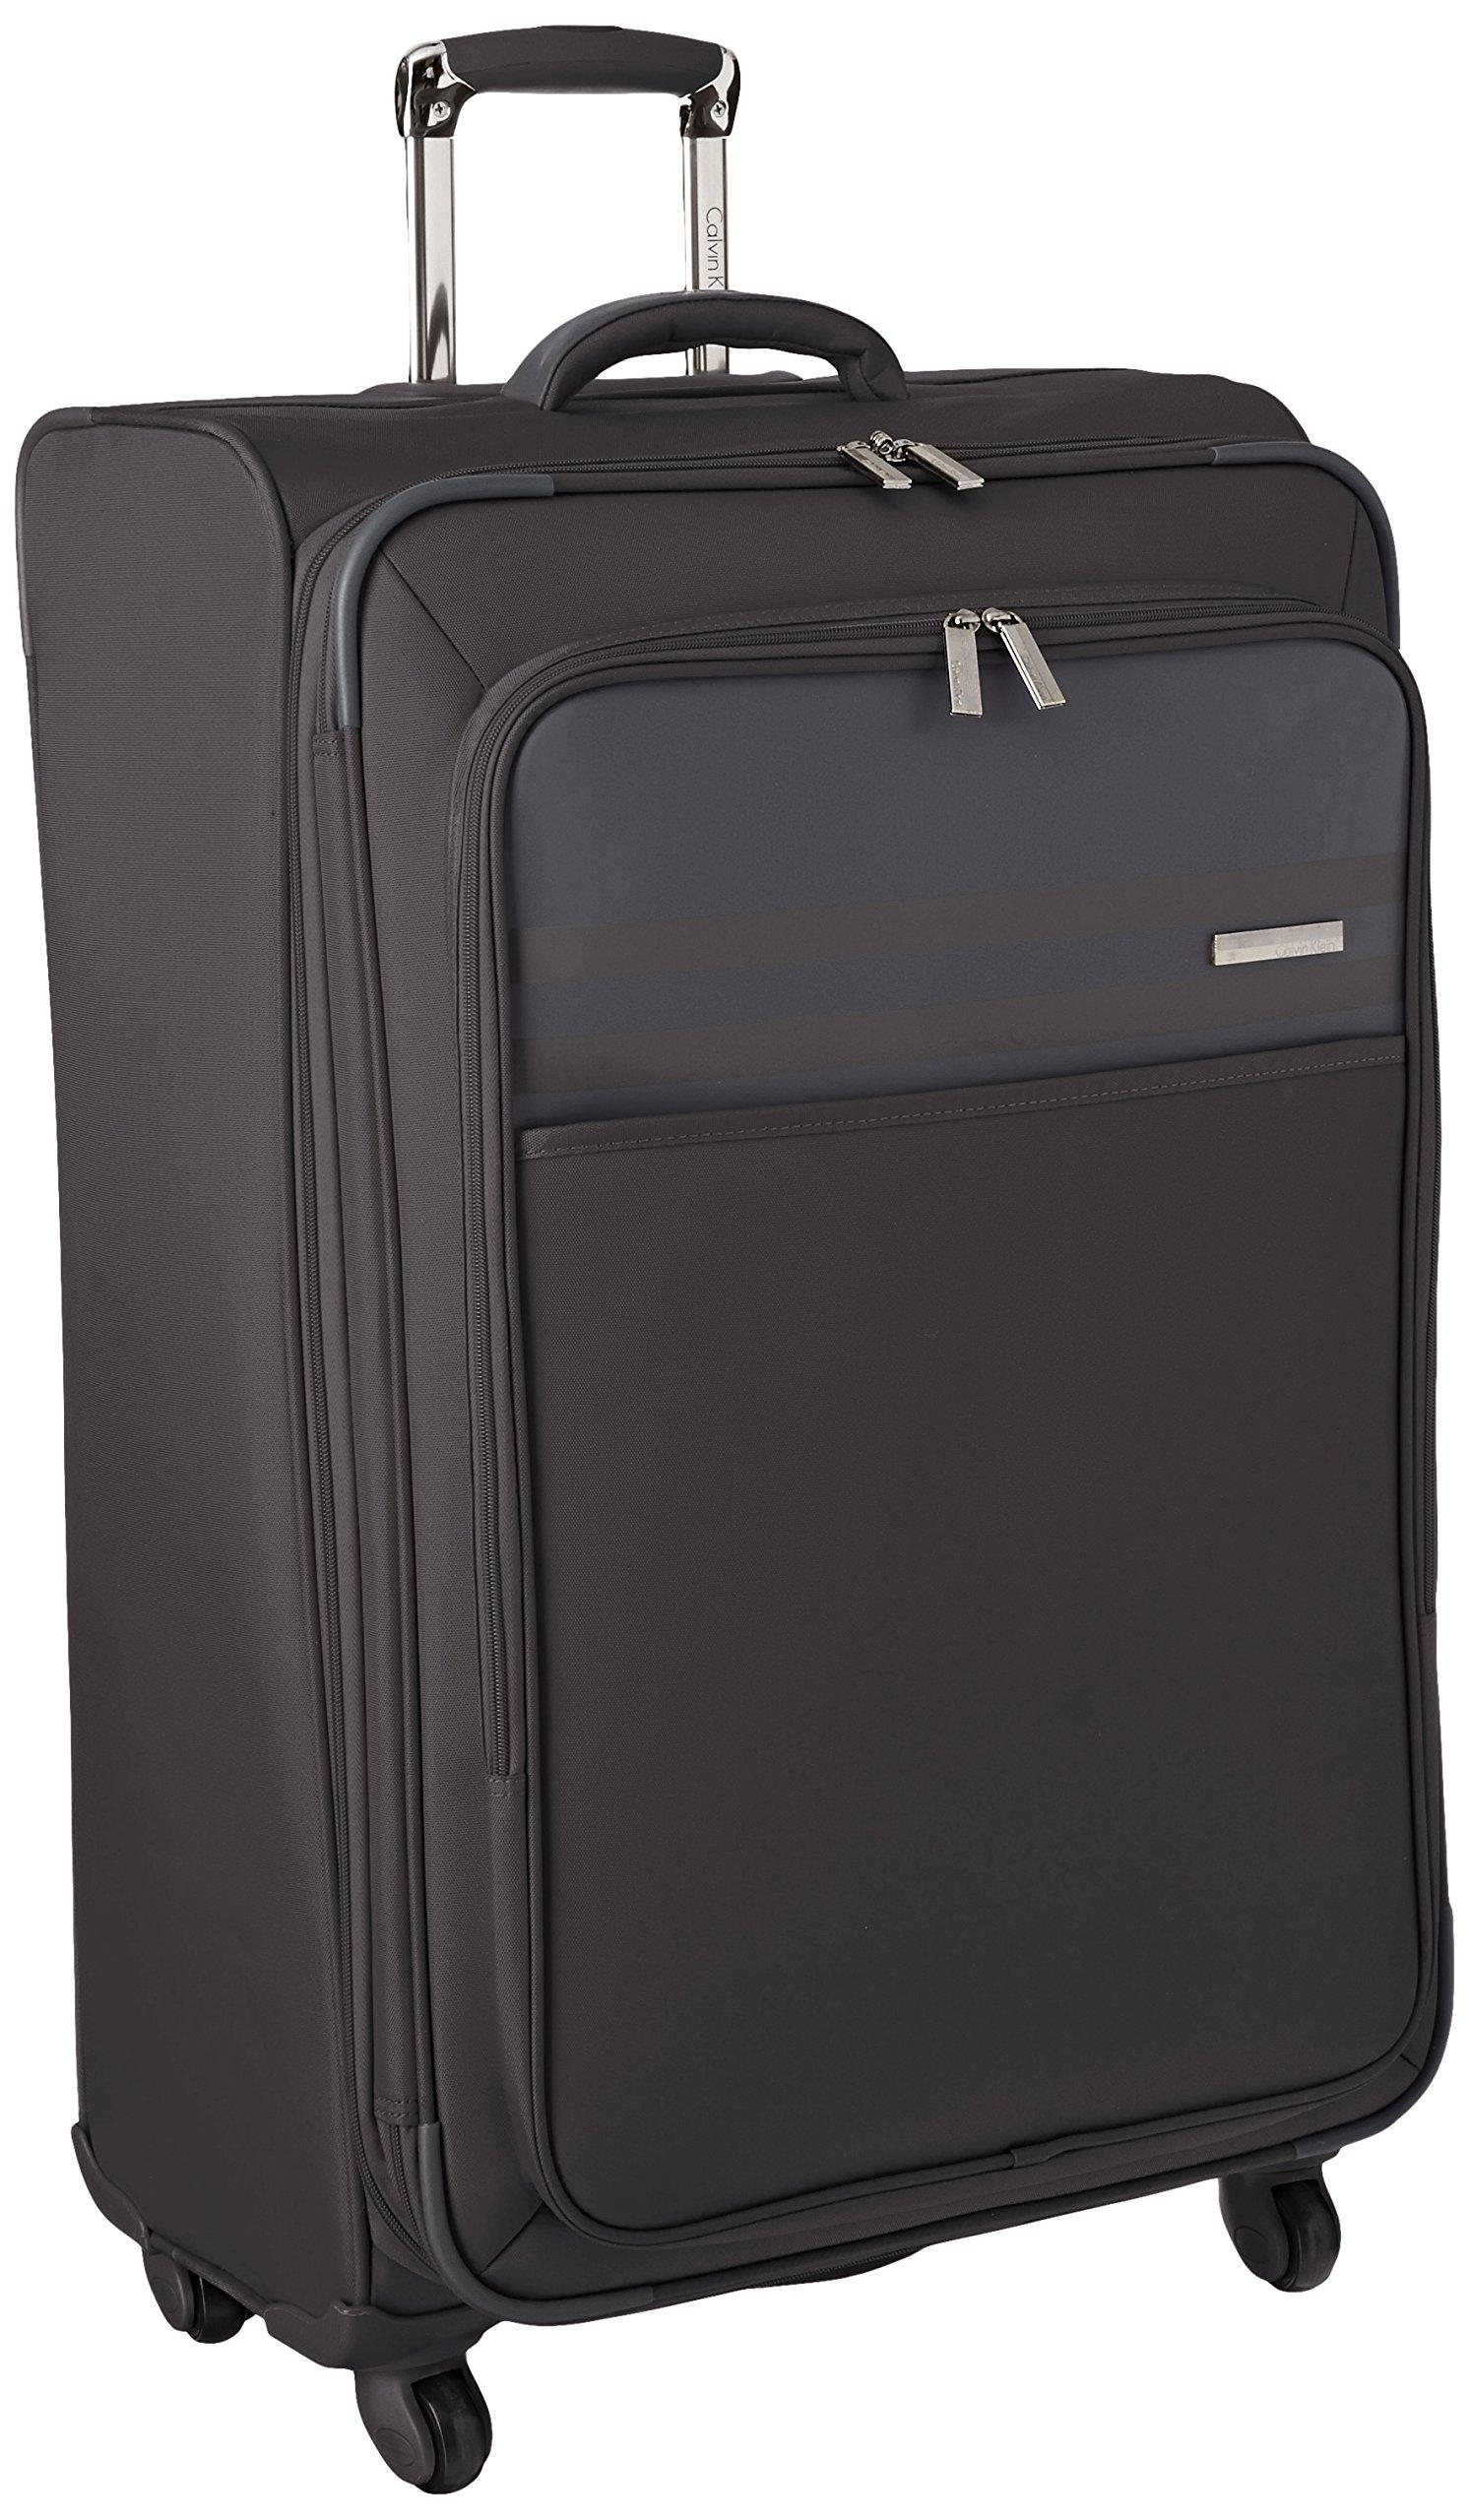 Calvin Klein Greenwich 2.0 29 Inch Upright Suitcase, Black, One Size